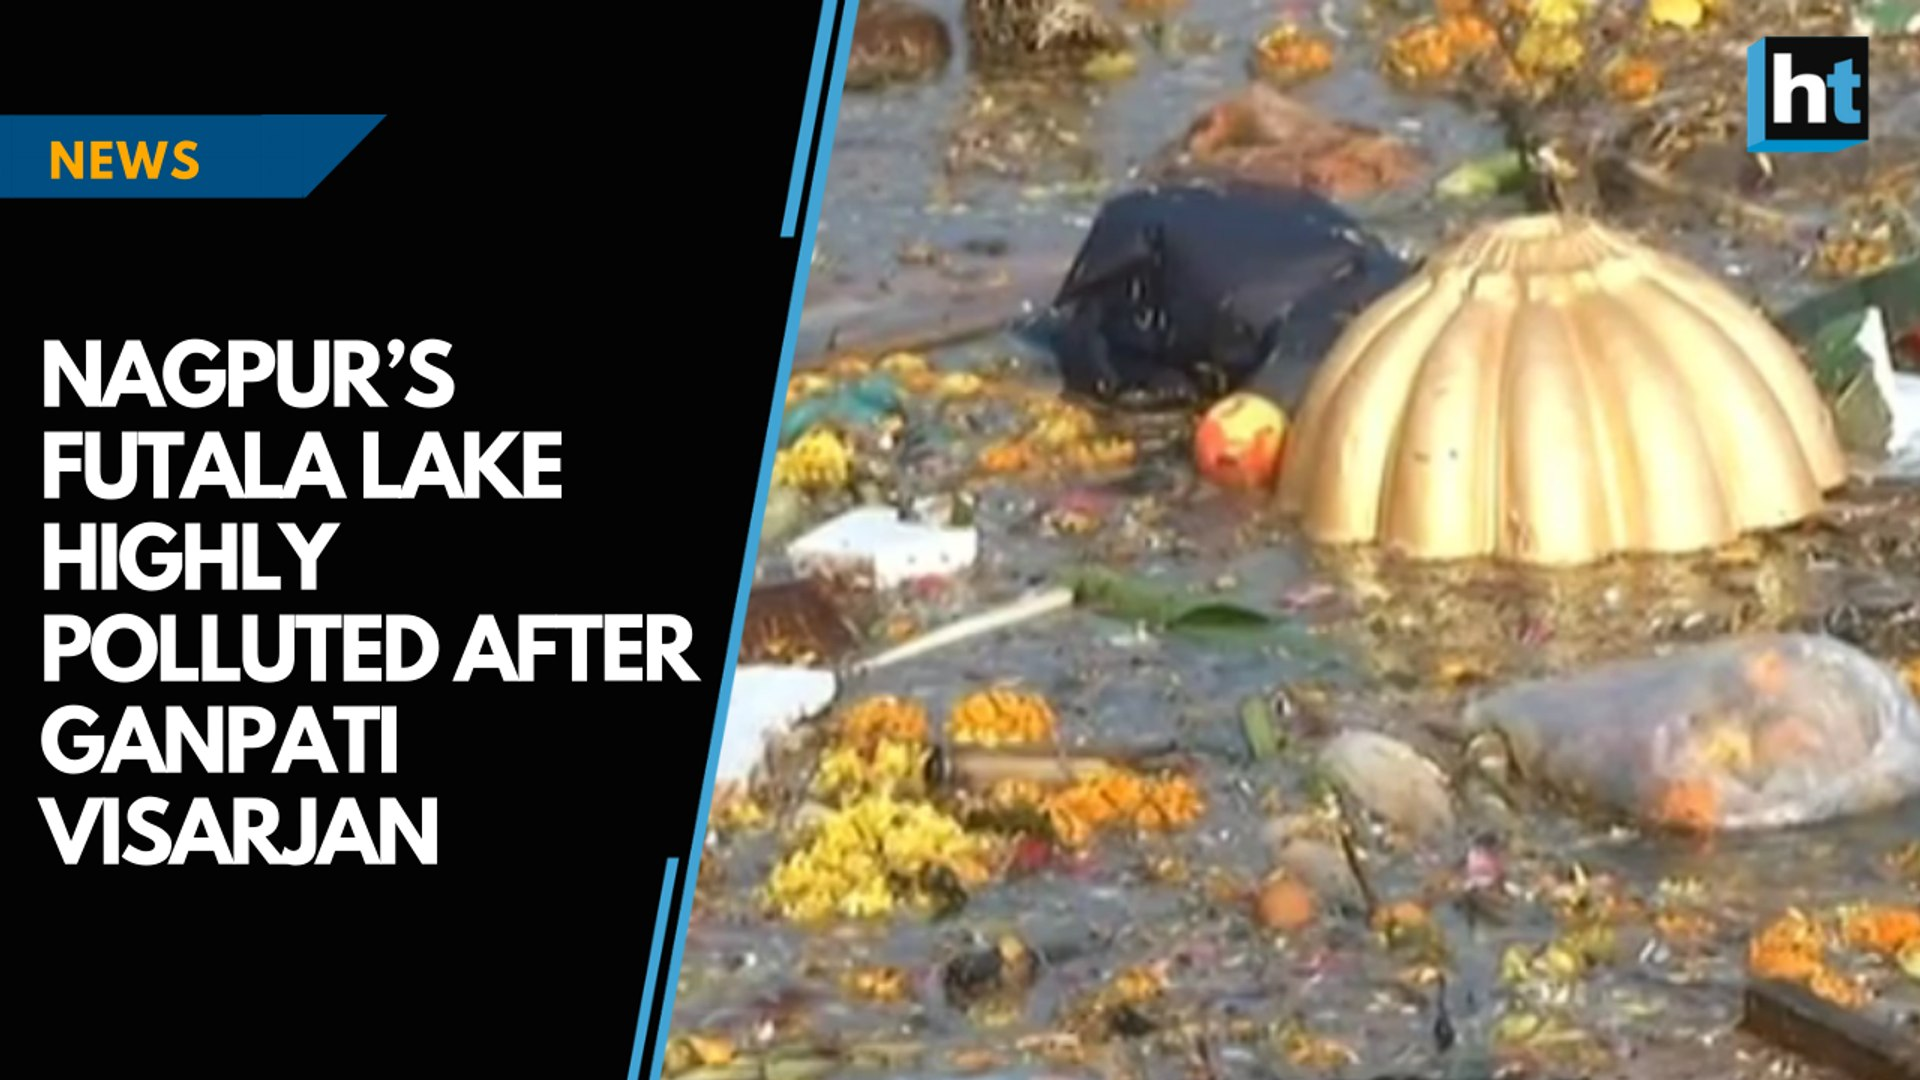 Nagpur's Futala Lake highly polluted after Ganpati Visarjan